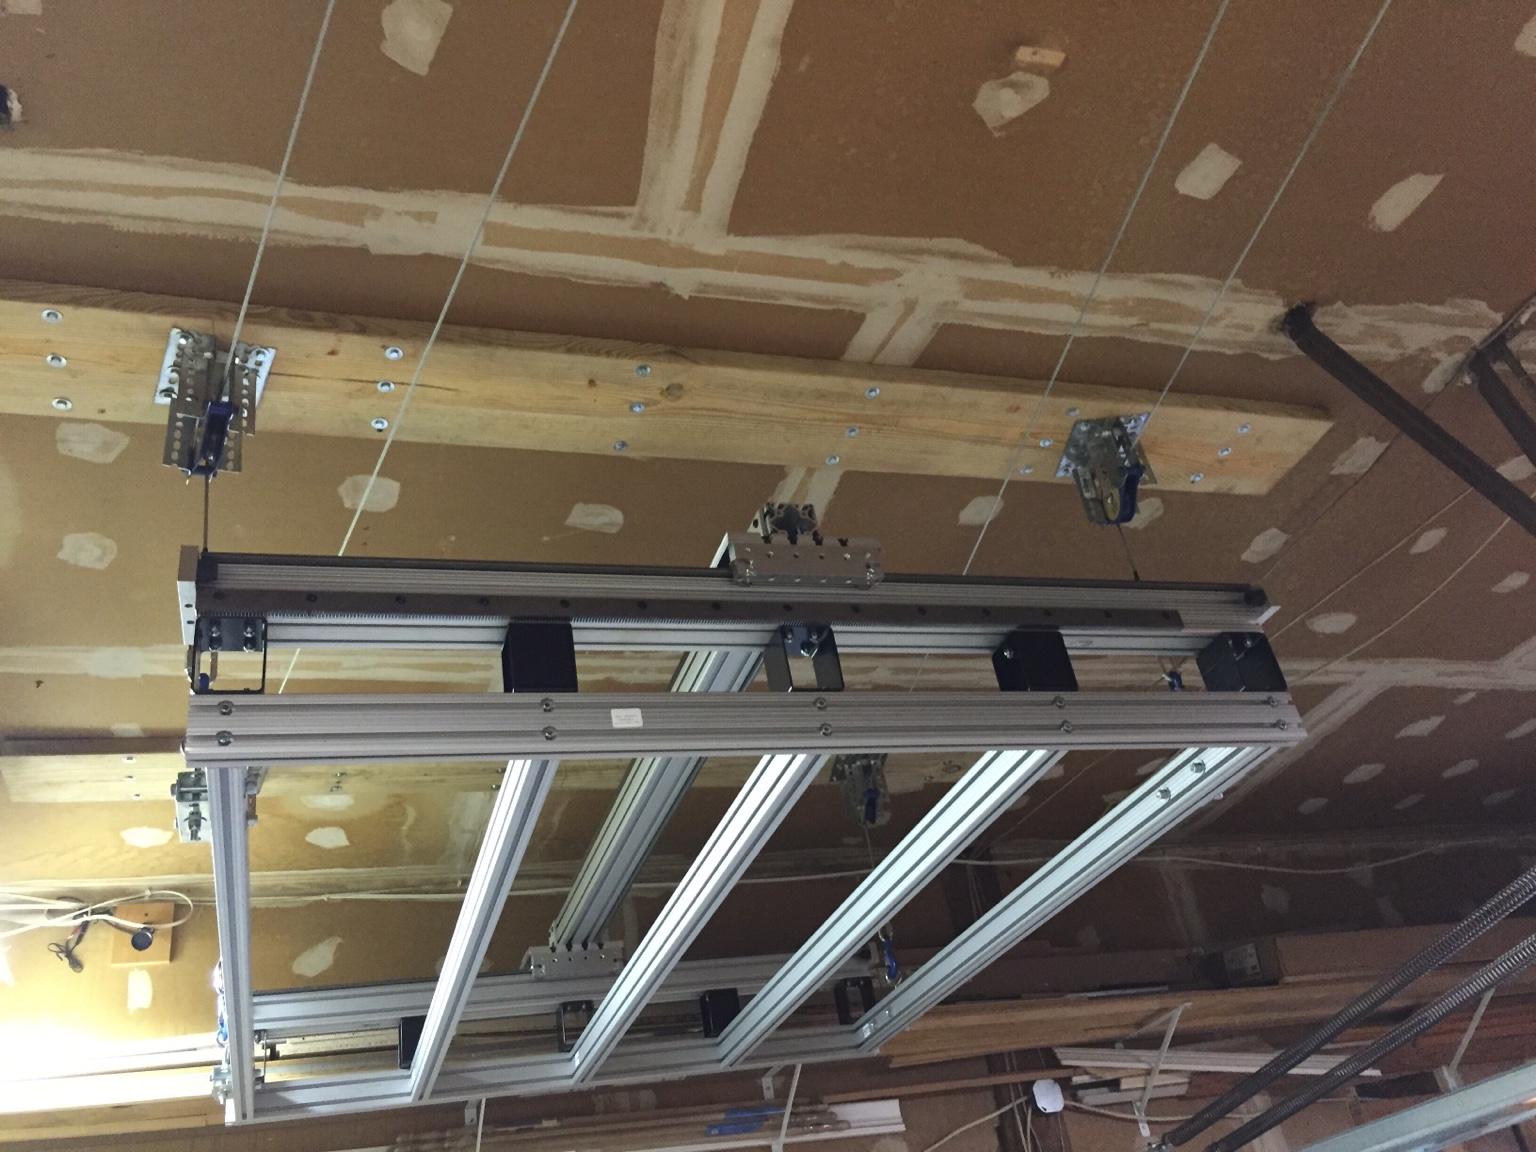 New Machine Build 4x4 On A Ceiling Hoist